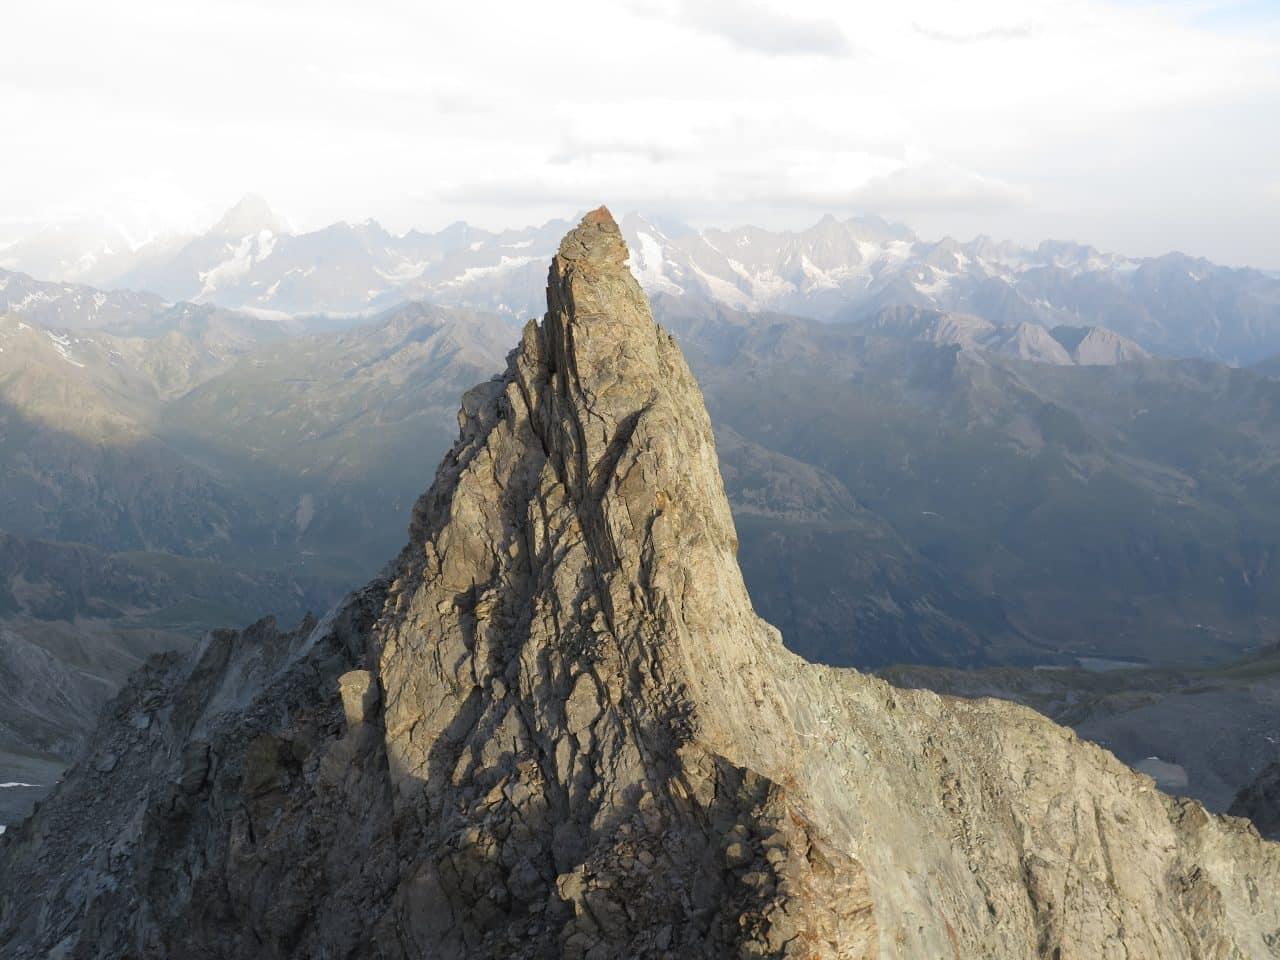 arete-de-tseudet-velan-dent-de-proz-valais-helyum-xavier-carrard-guide-de-montagne-geneve